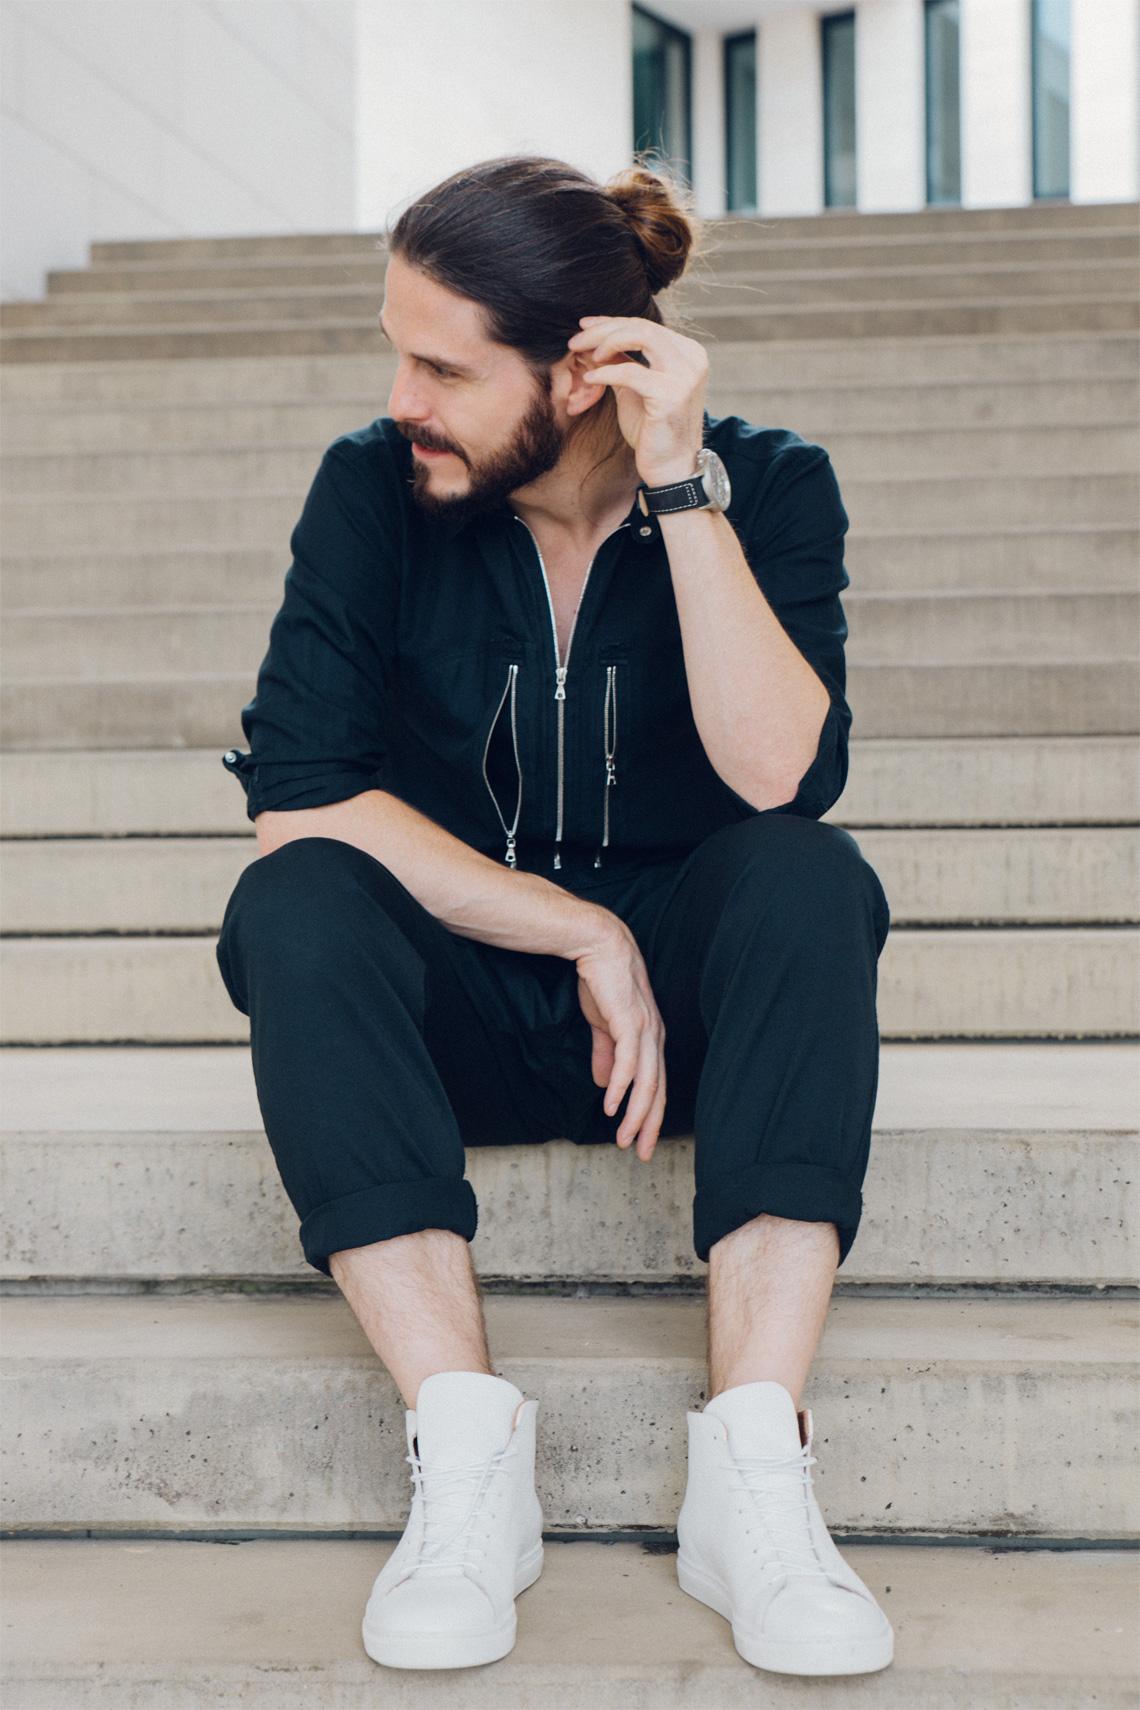 Kaisers-neue-Kleider-Malefashion-Blog-Sommer-Outfit-Black-Stoffhose-Sandro-AVI-8-Uhr-Weisse-Schuhe